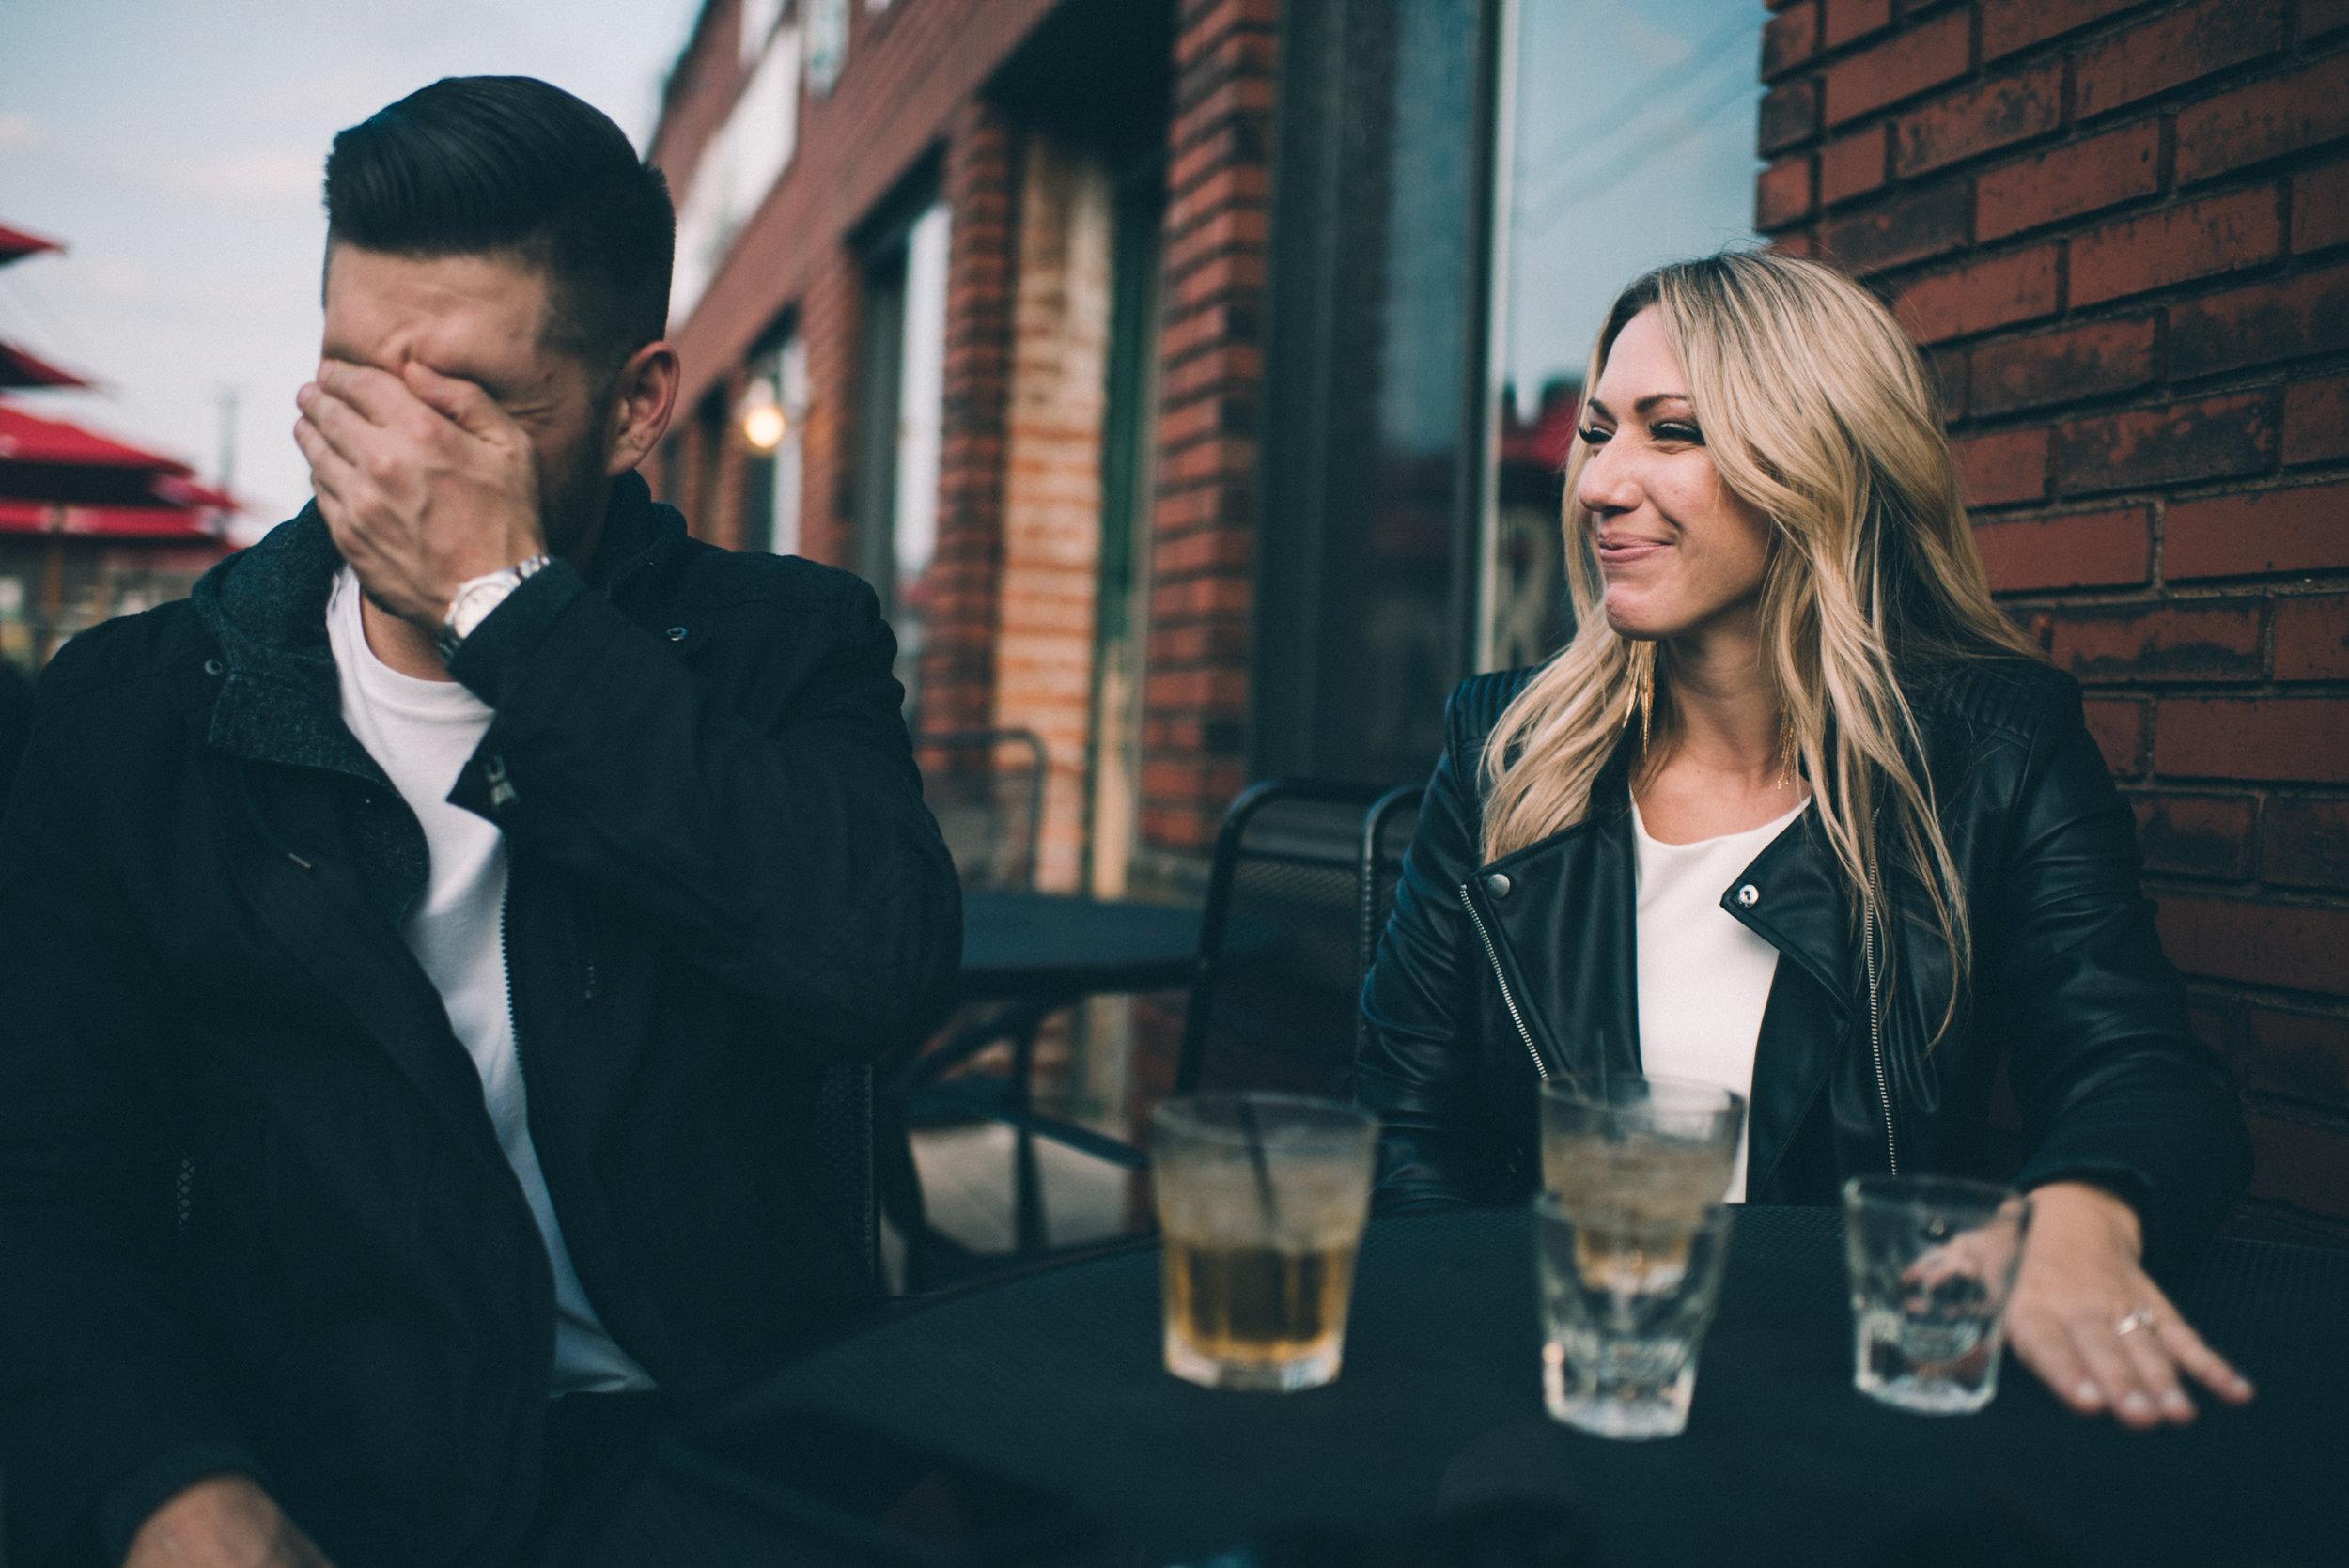 Pittsburgh Wedding Photographer - Stirpe-90.jpg